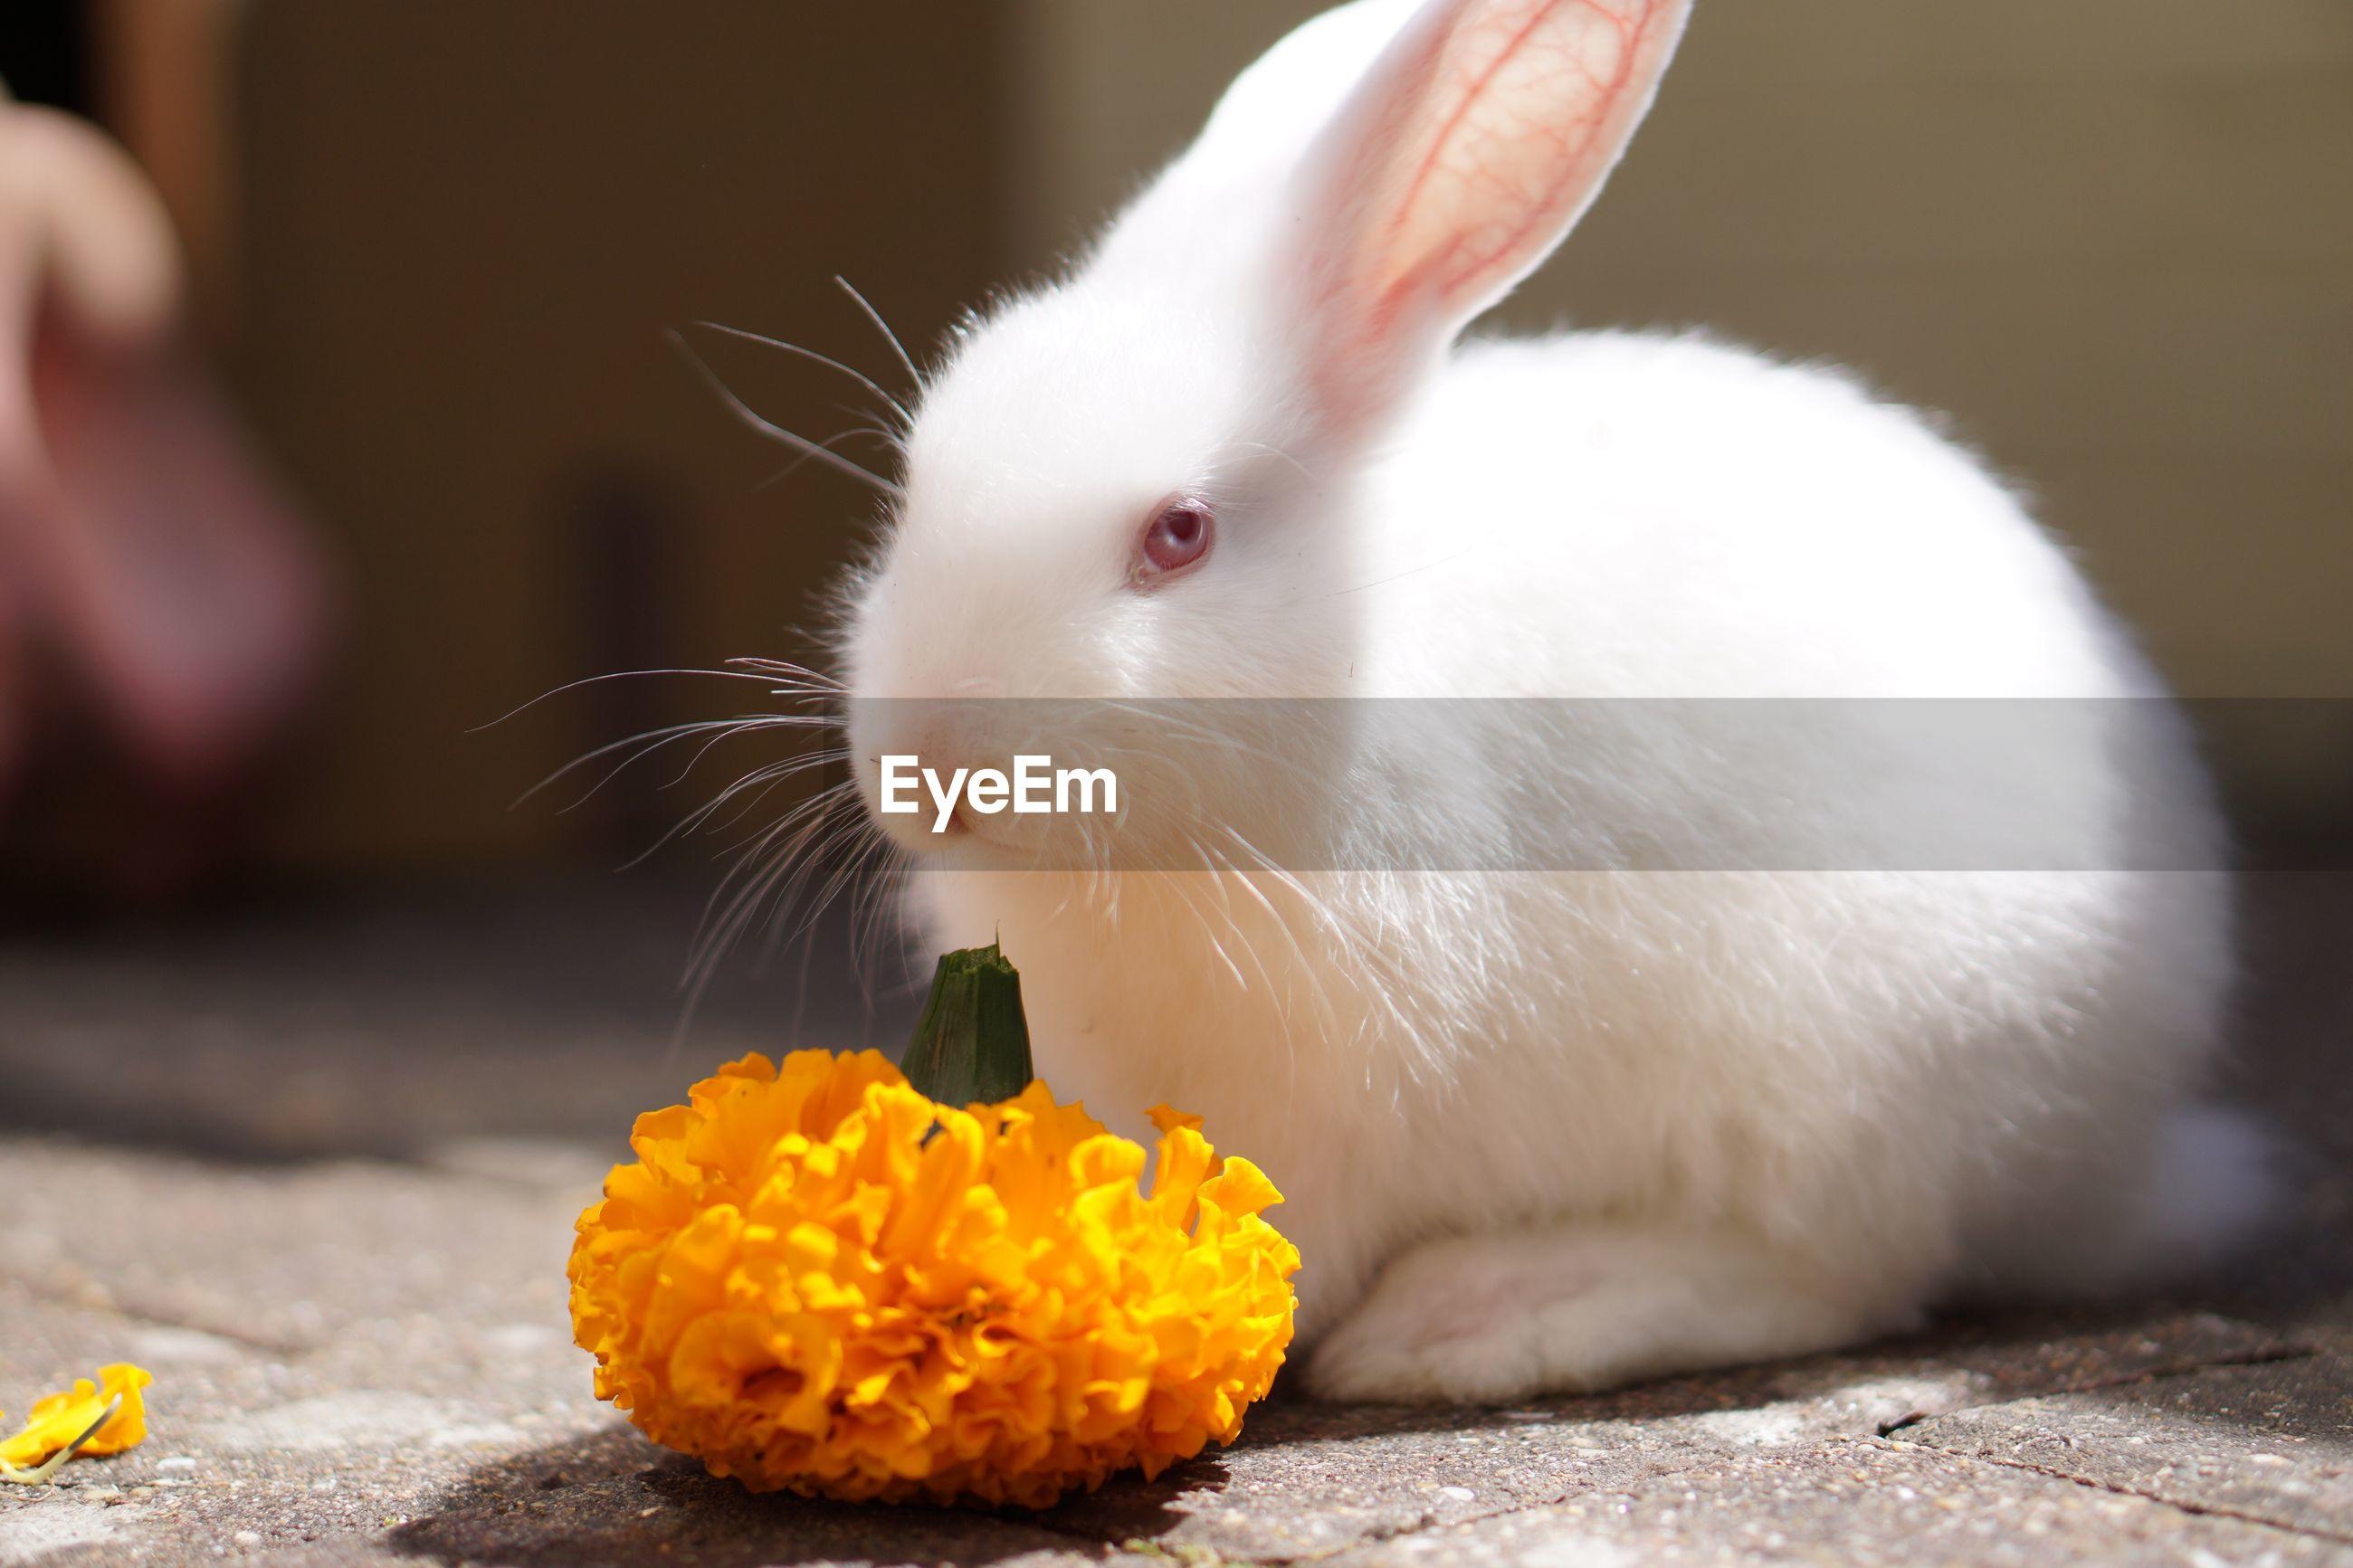 Close-up of white rabbit by marigold on sidewalk